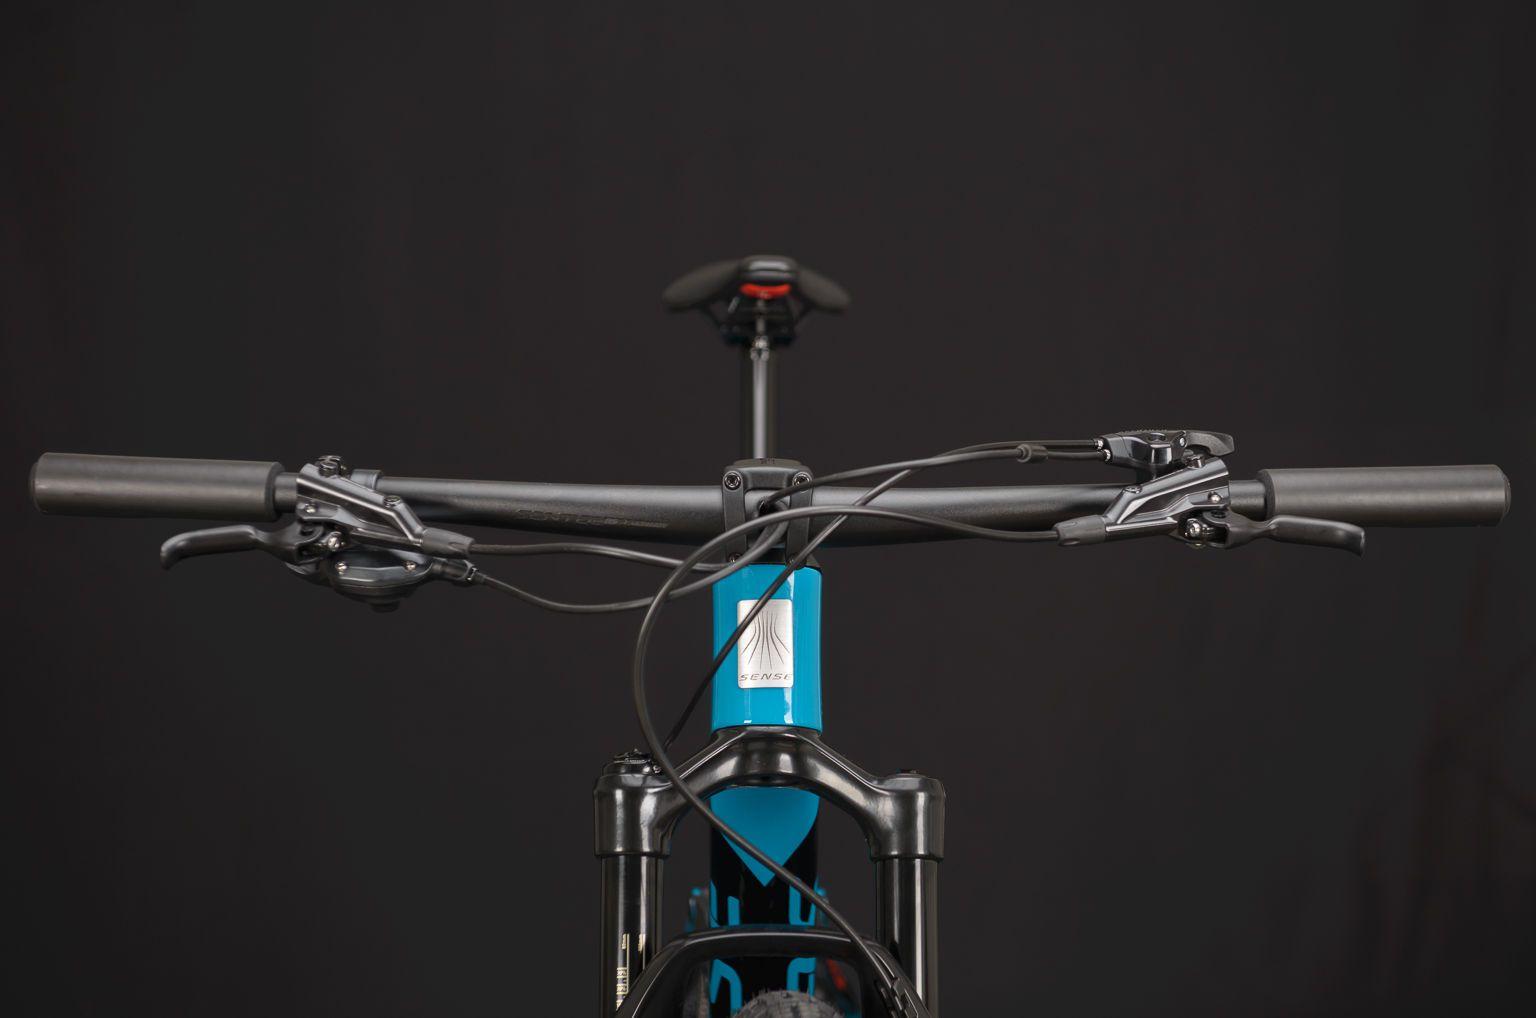 Bicicleta SENSE Invictus Comp 2020 - Laranja/Acqua